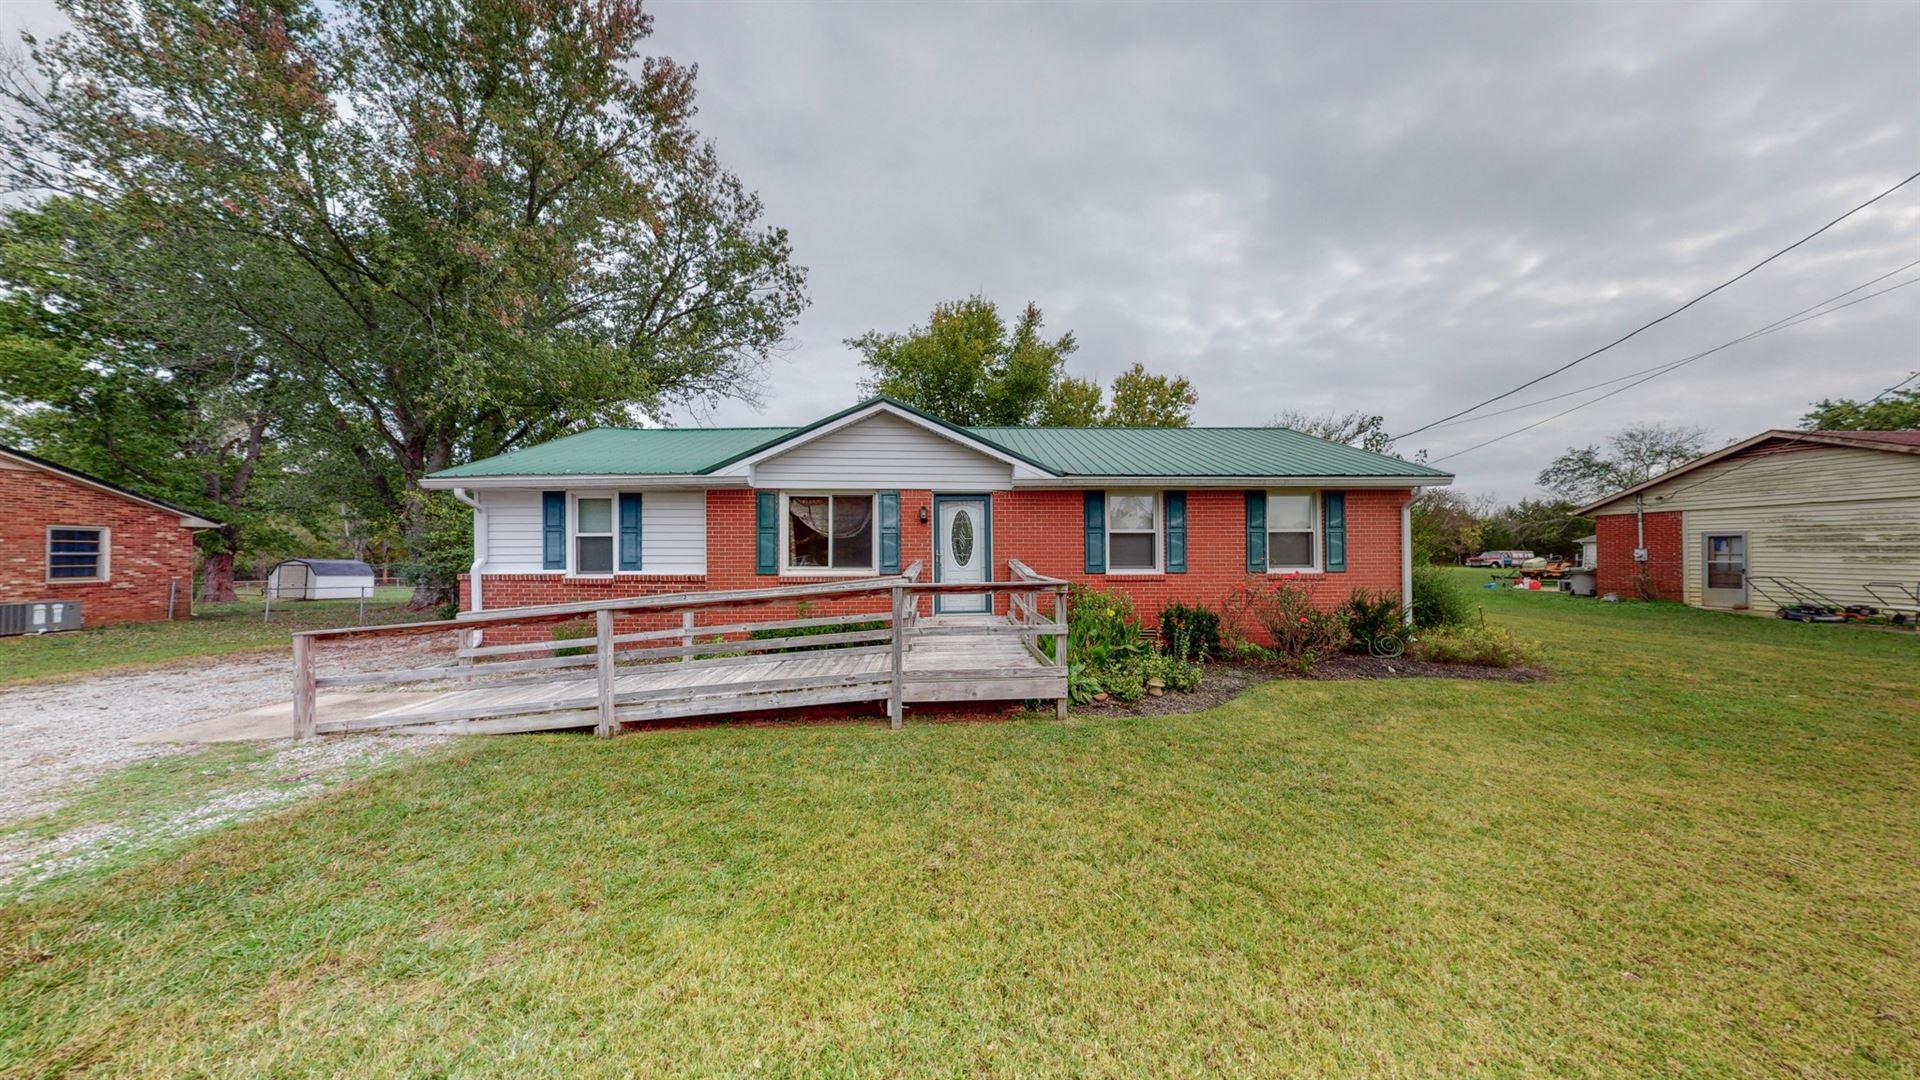 807 Double Springs Rd, Murfreesboro, TN 37127 - MLS#: 2202865